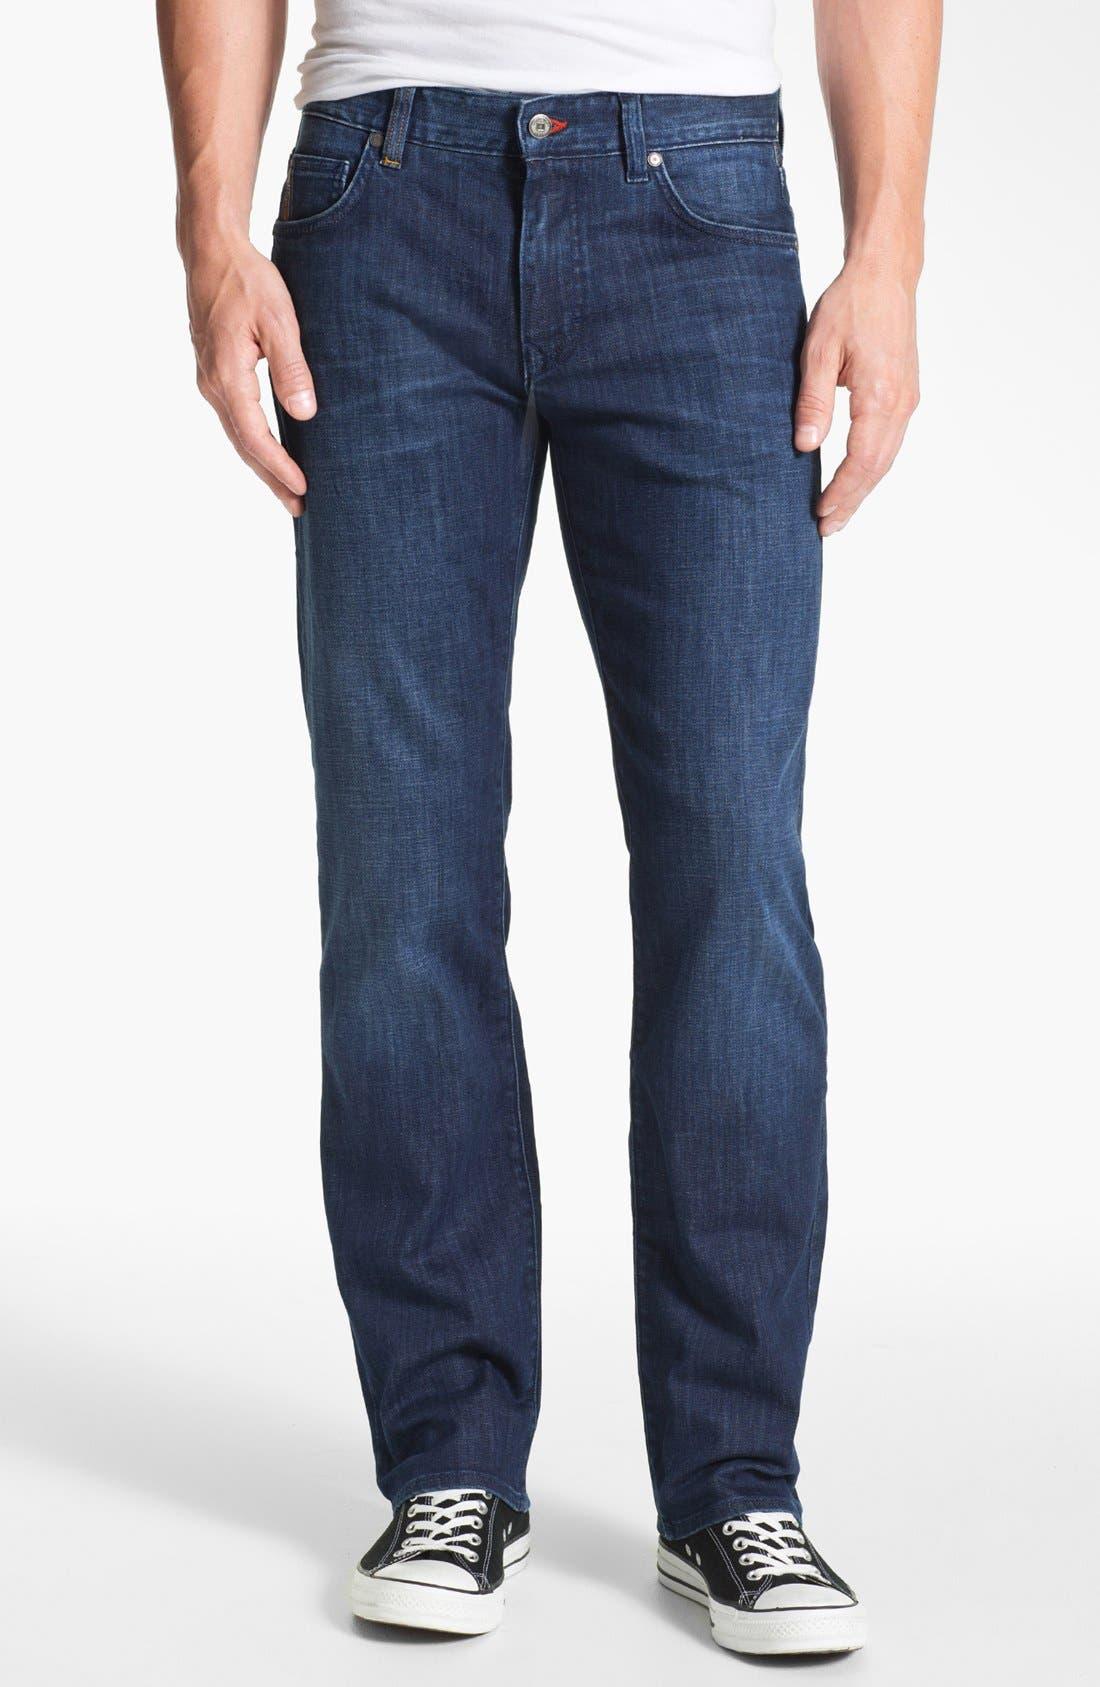 Alternate Image 1 Selected - BOSS Black 'Kansas' Regular Fit Jeans (Blue Authentic)